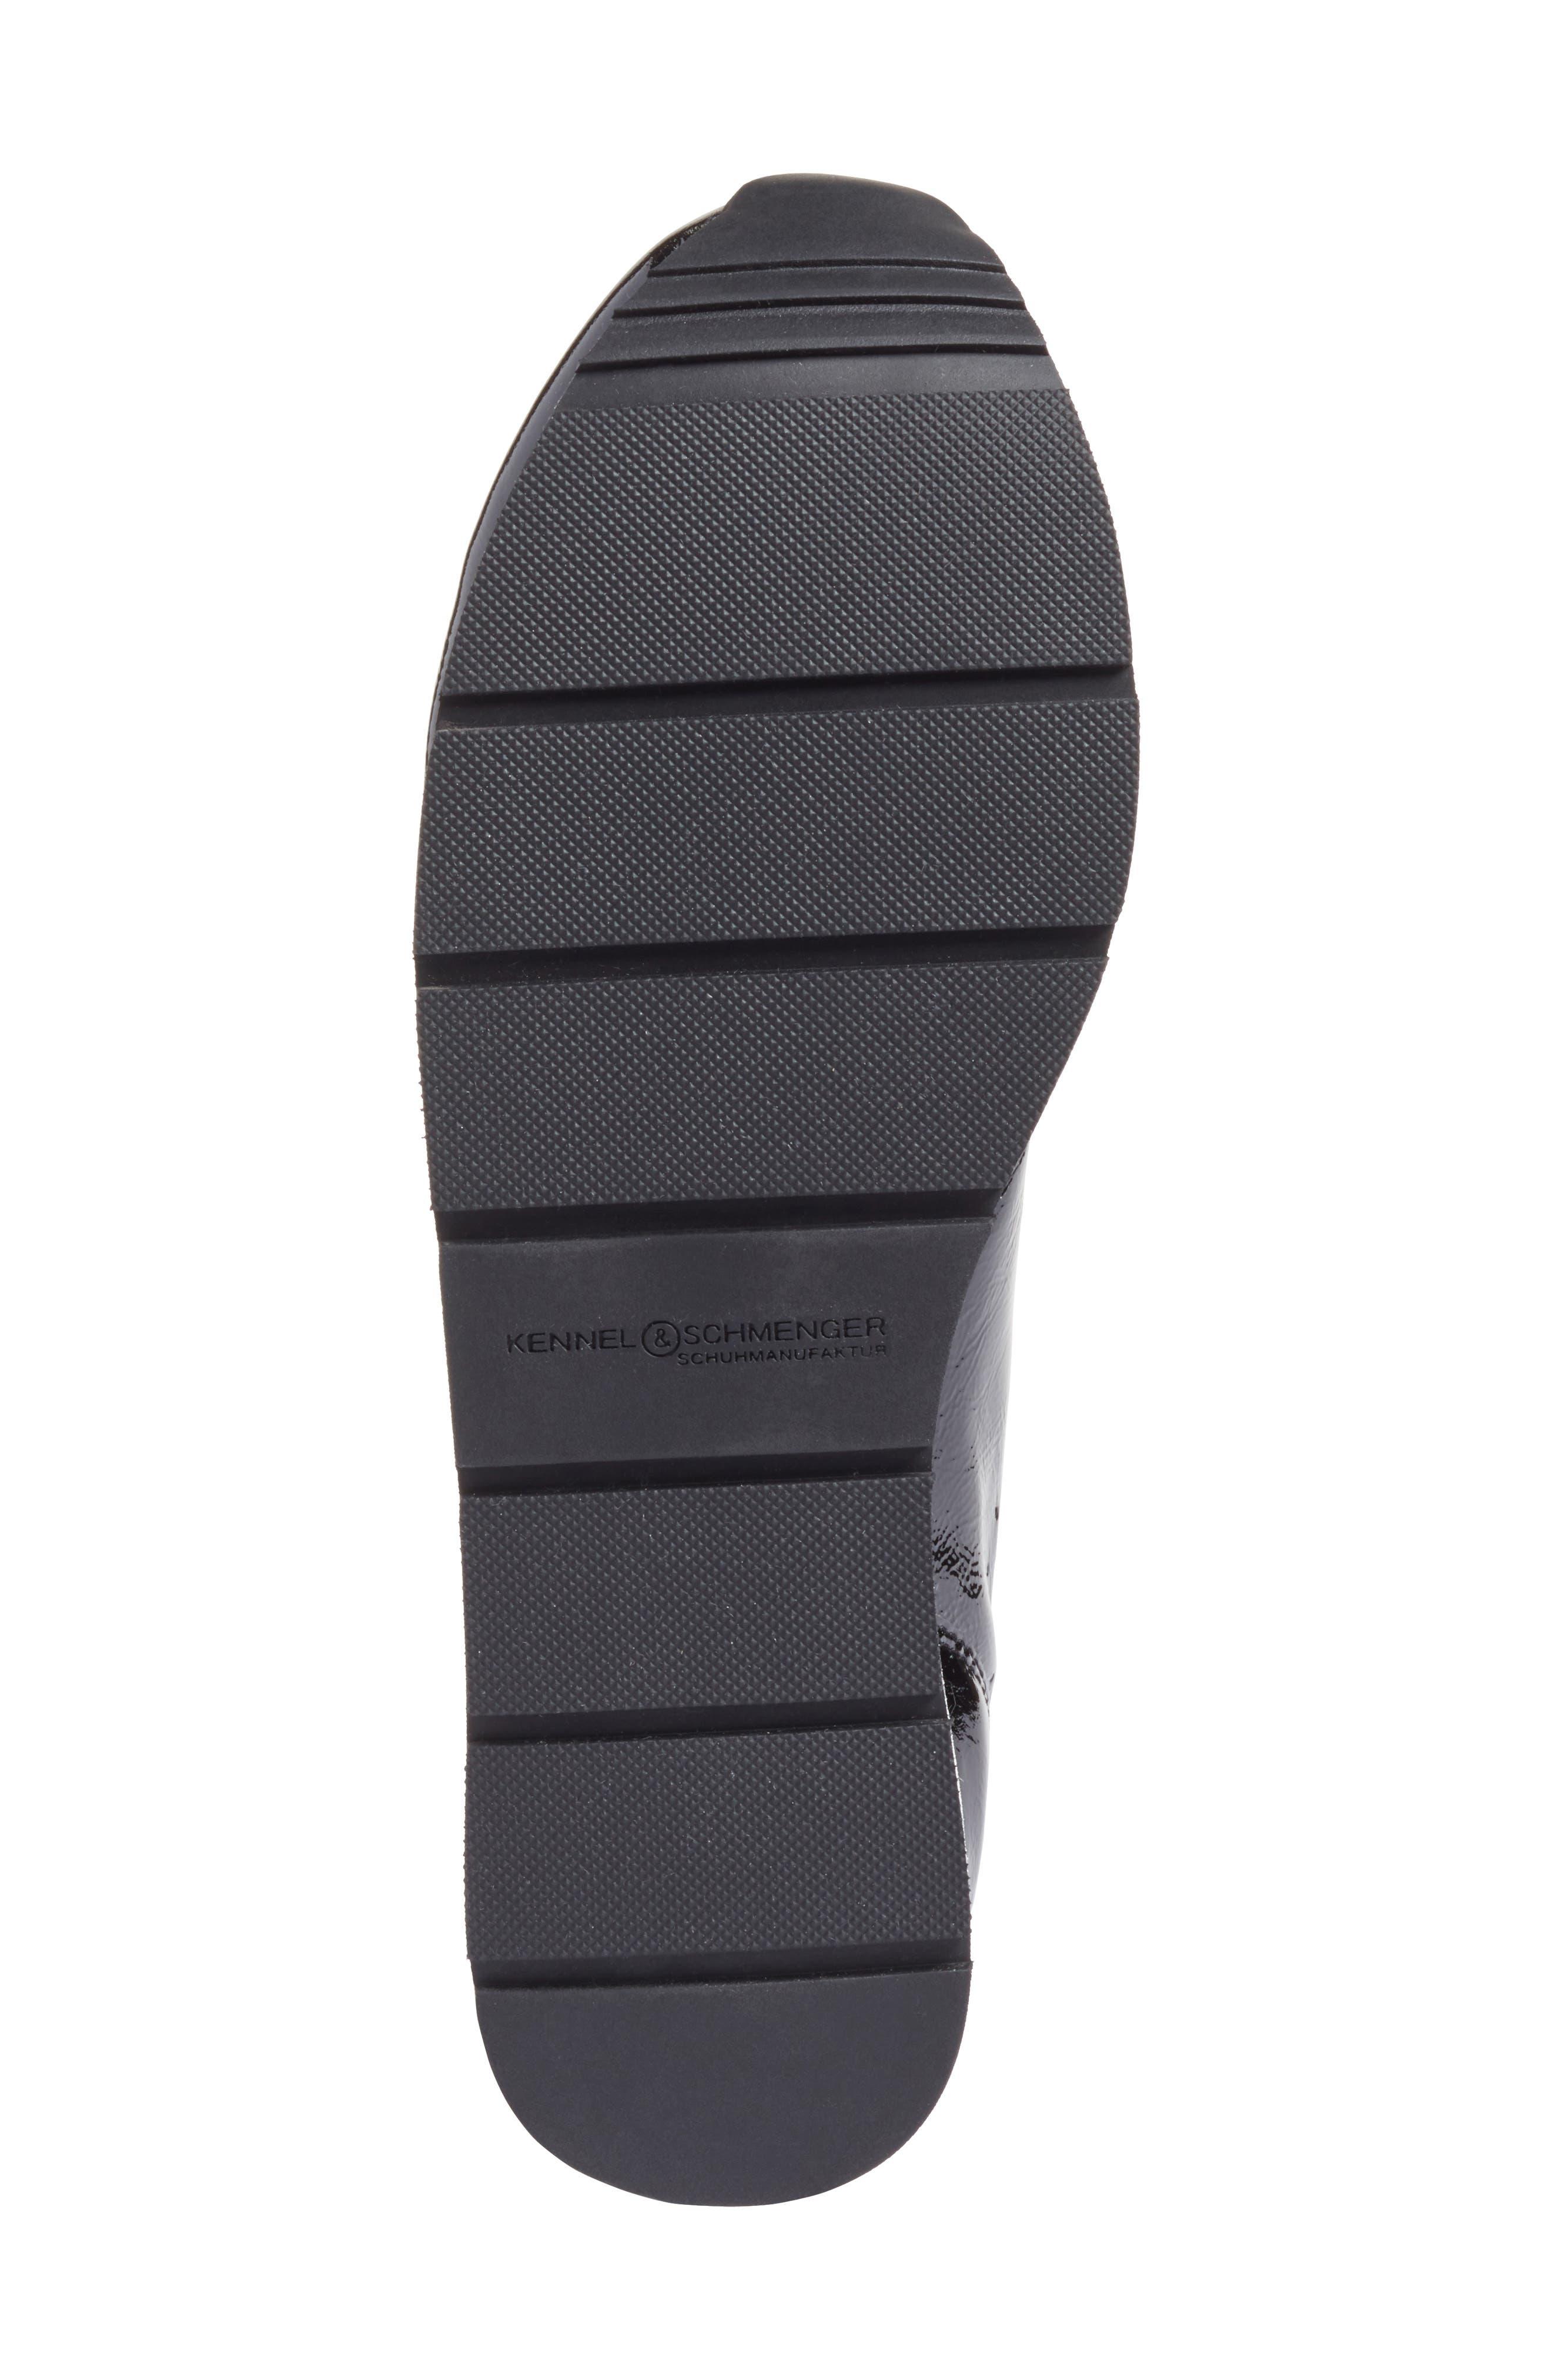 Kennel & Schmenger Nova Patent Leather Sneaker,                             Alternate thumbnail 6, color,                             Black